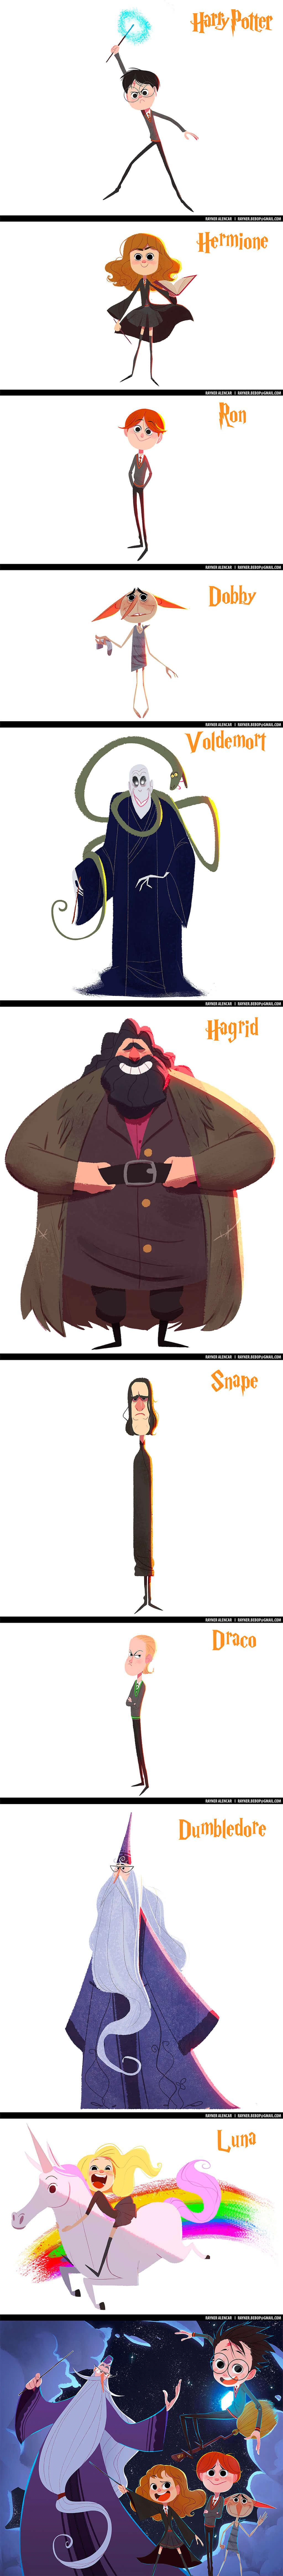 Harry Potter Fan Art by Rayner Alencar